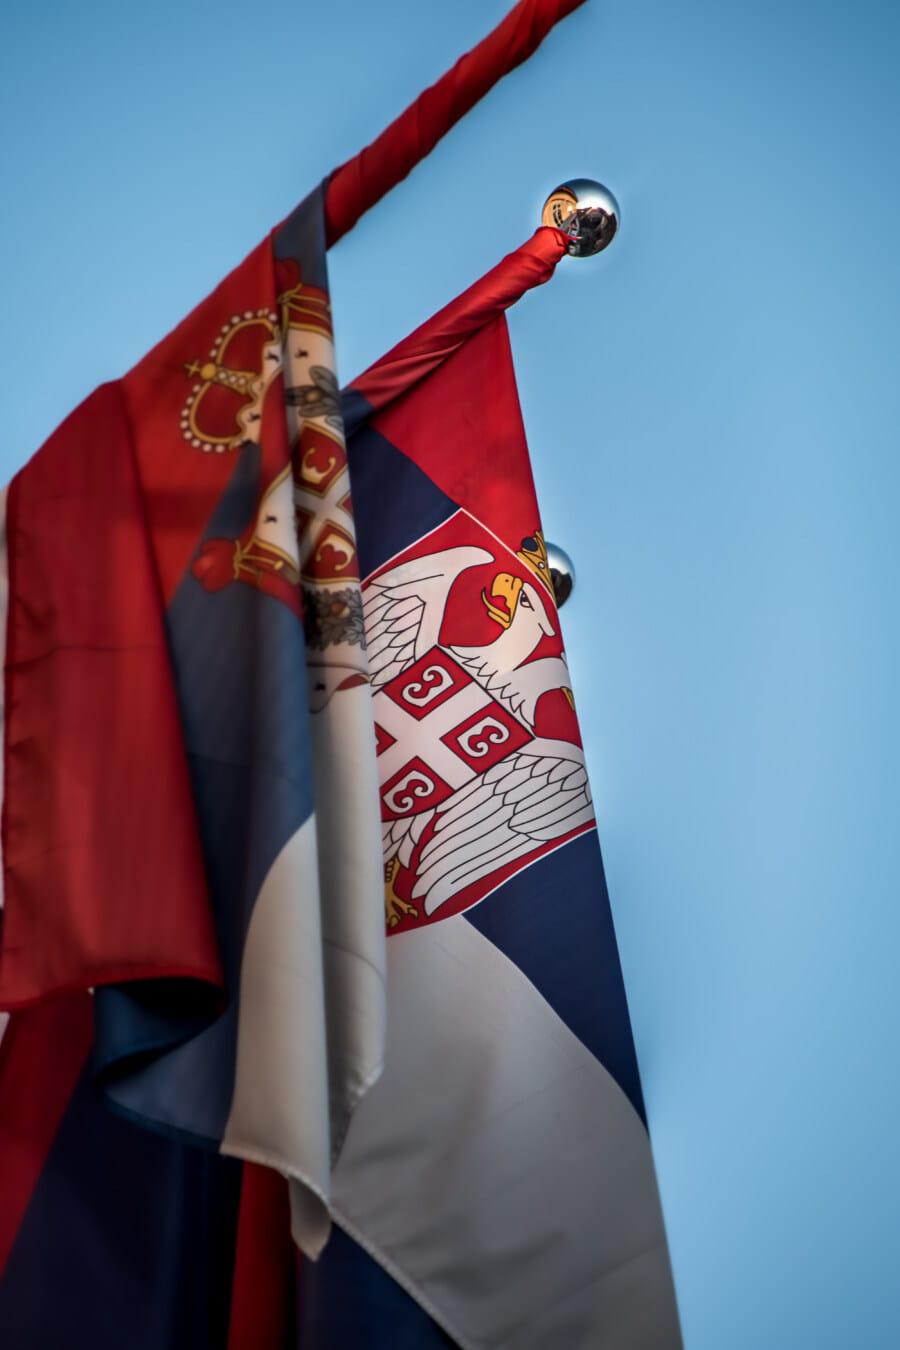 democracy, democratic republic, Serbia, flag, eagle, crown, heraldry, emblem, patriotism, wind